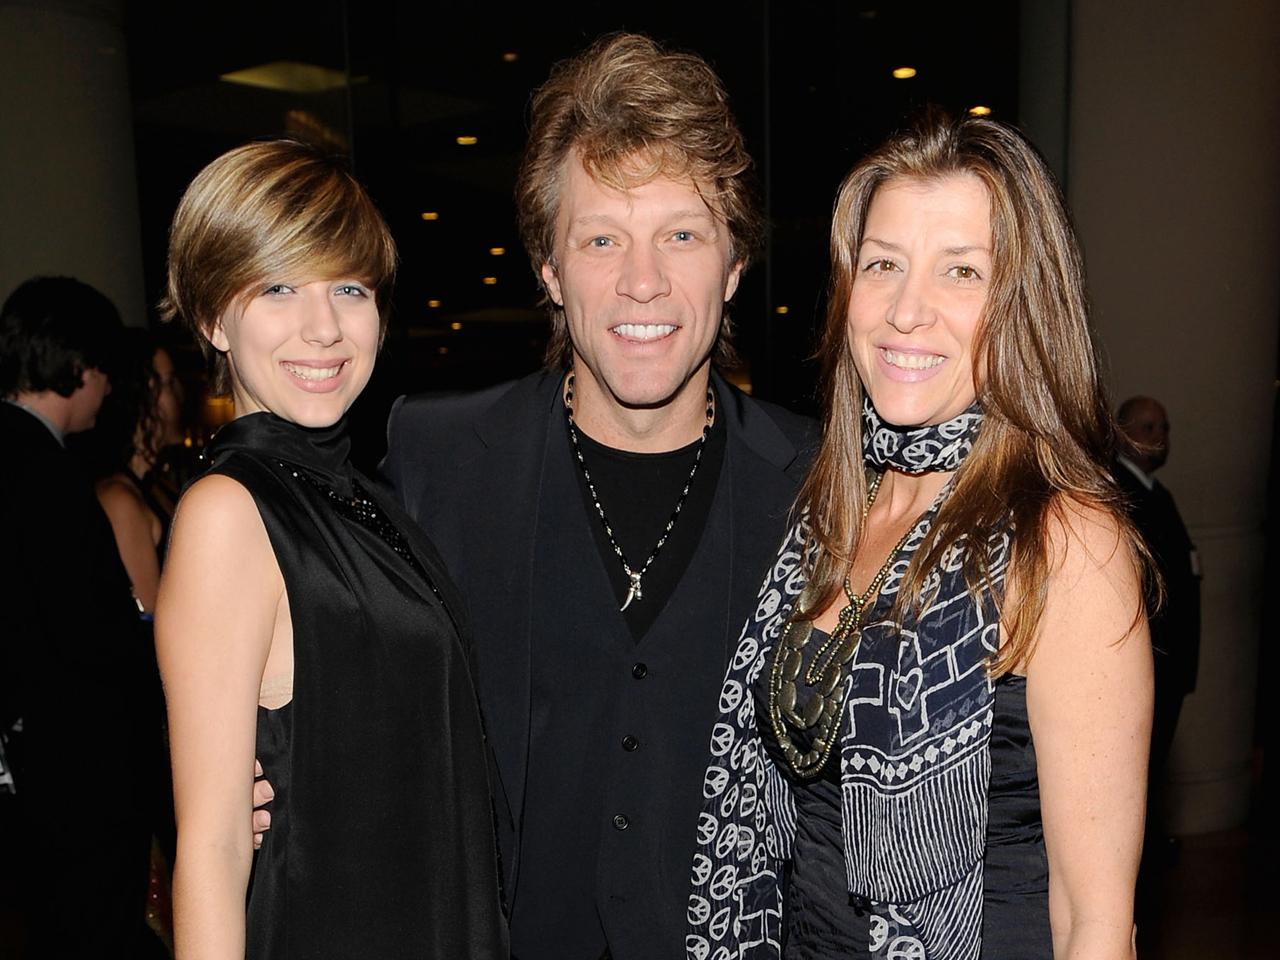 Jon Bon Jovis daughter recovering after heroin overdose